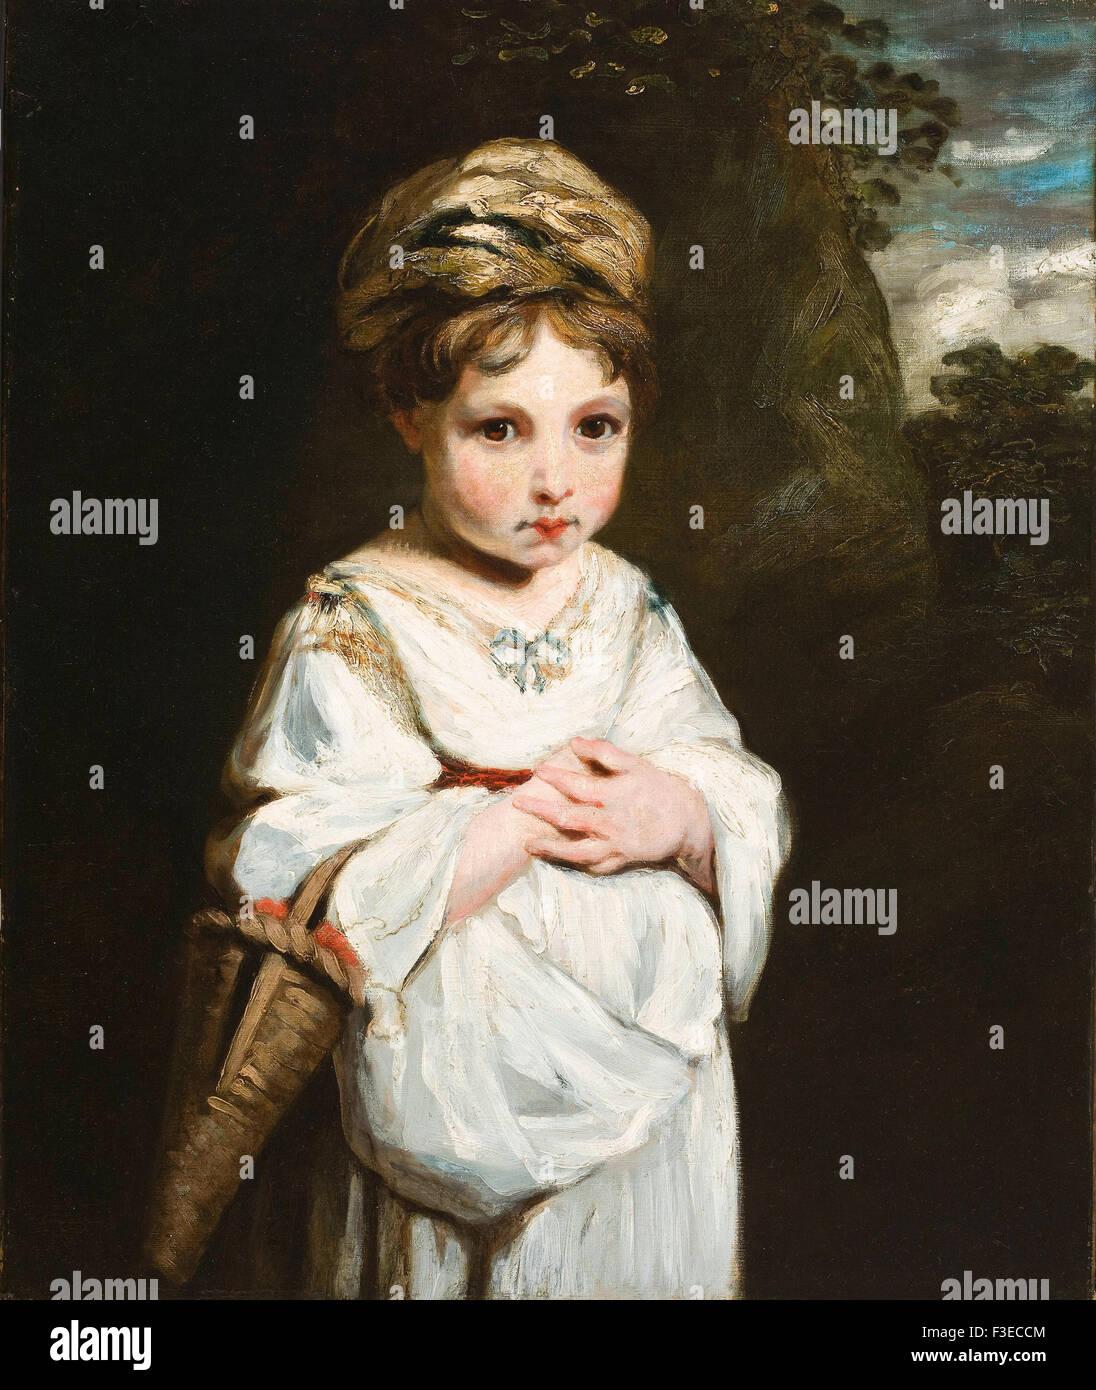 Sir Joshua Reynolds - The Strawberry Girl - Stock Image